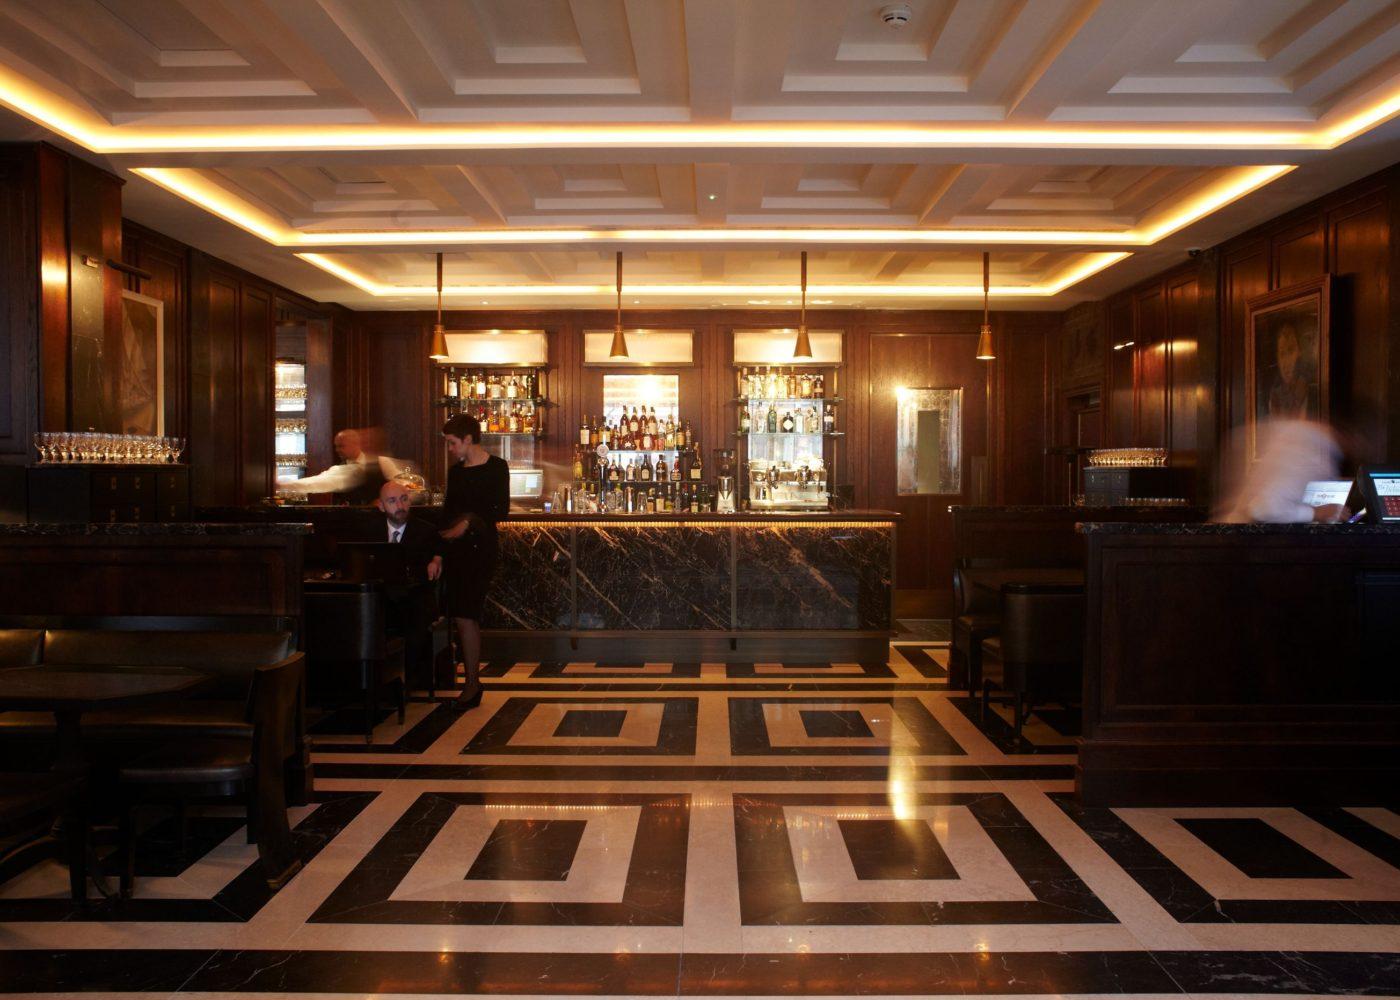 The Delaunay Bar